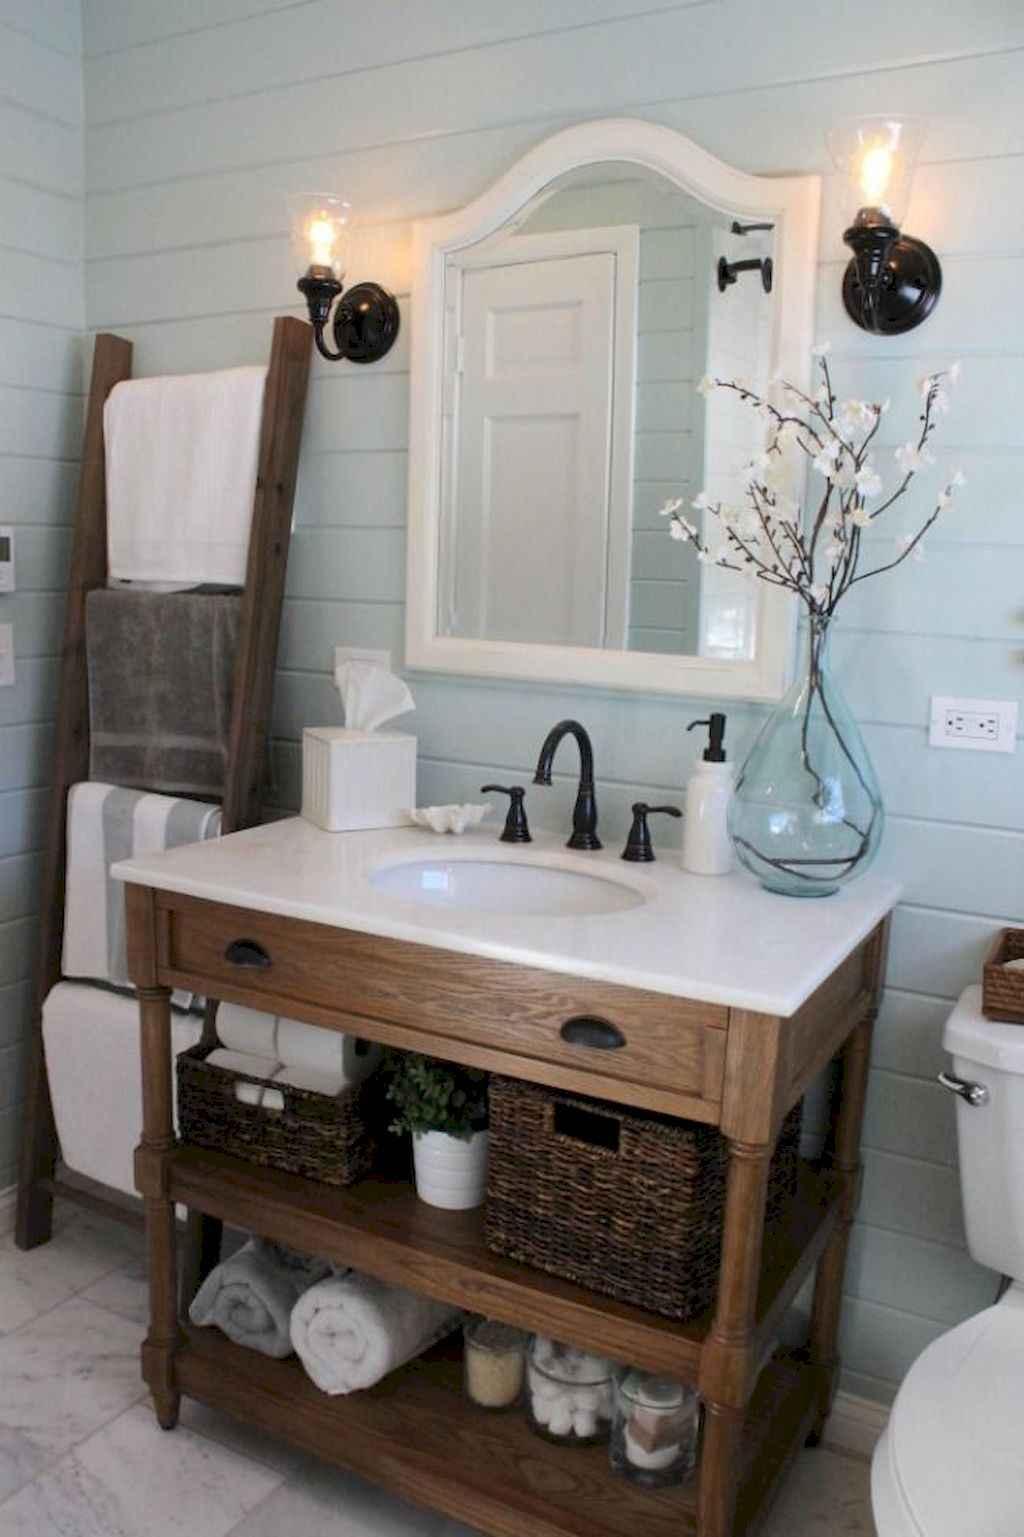 125 awesome farmhouse bathroom vanity remodel ideas (36)